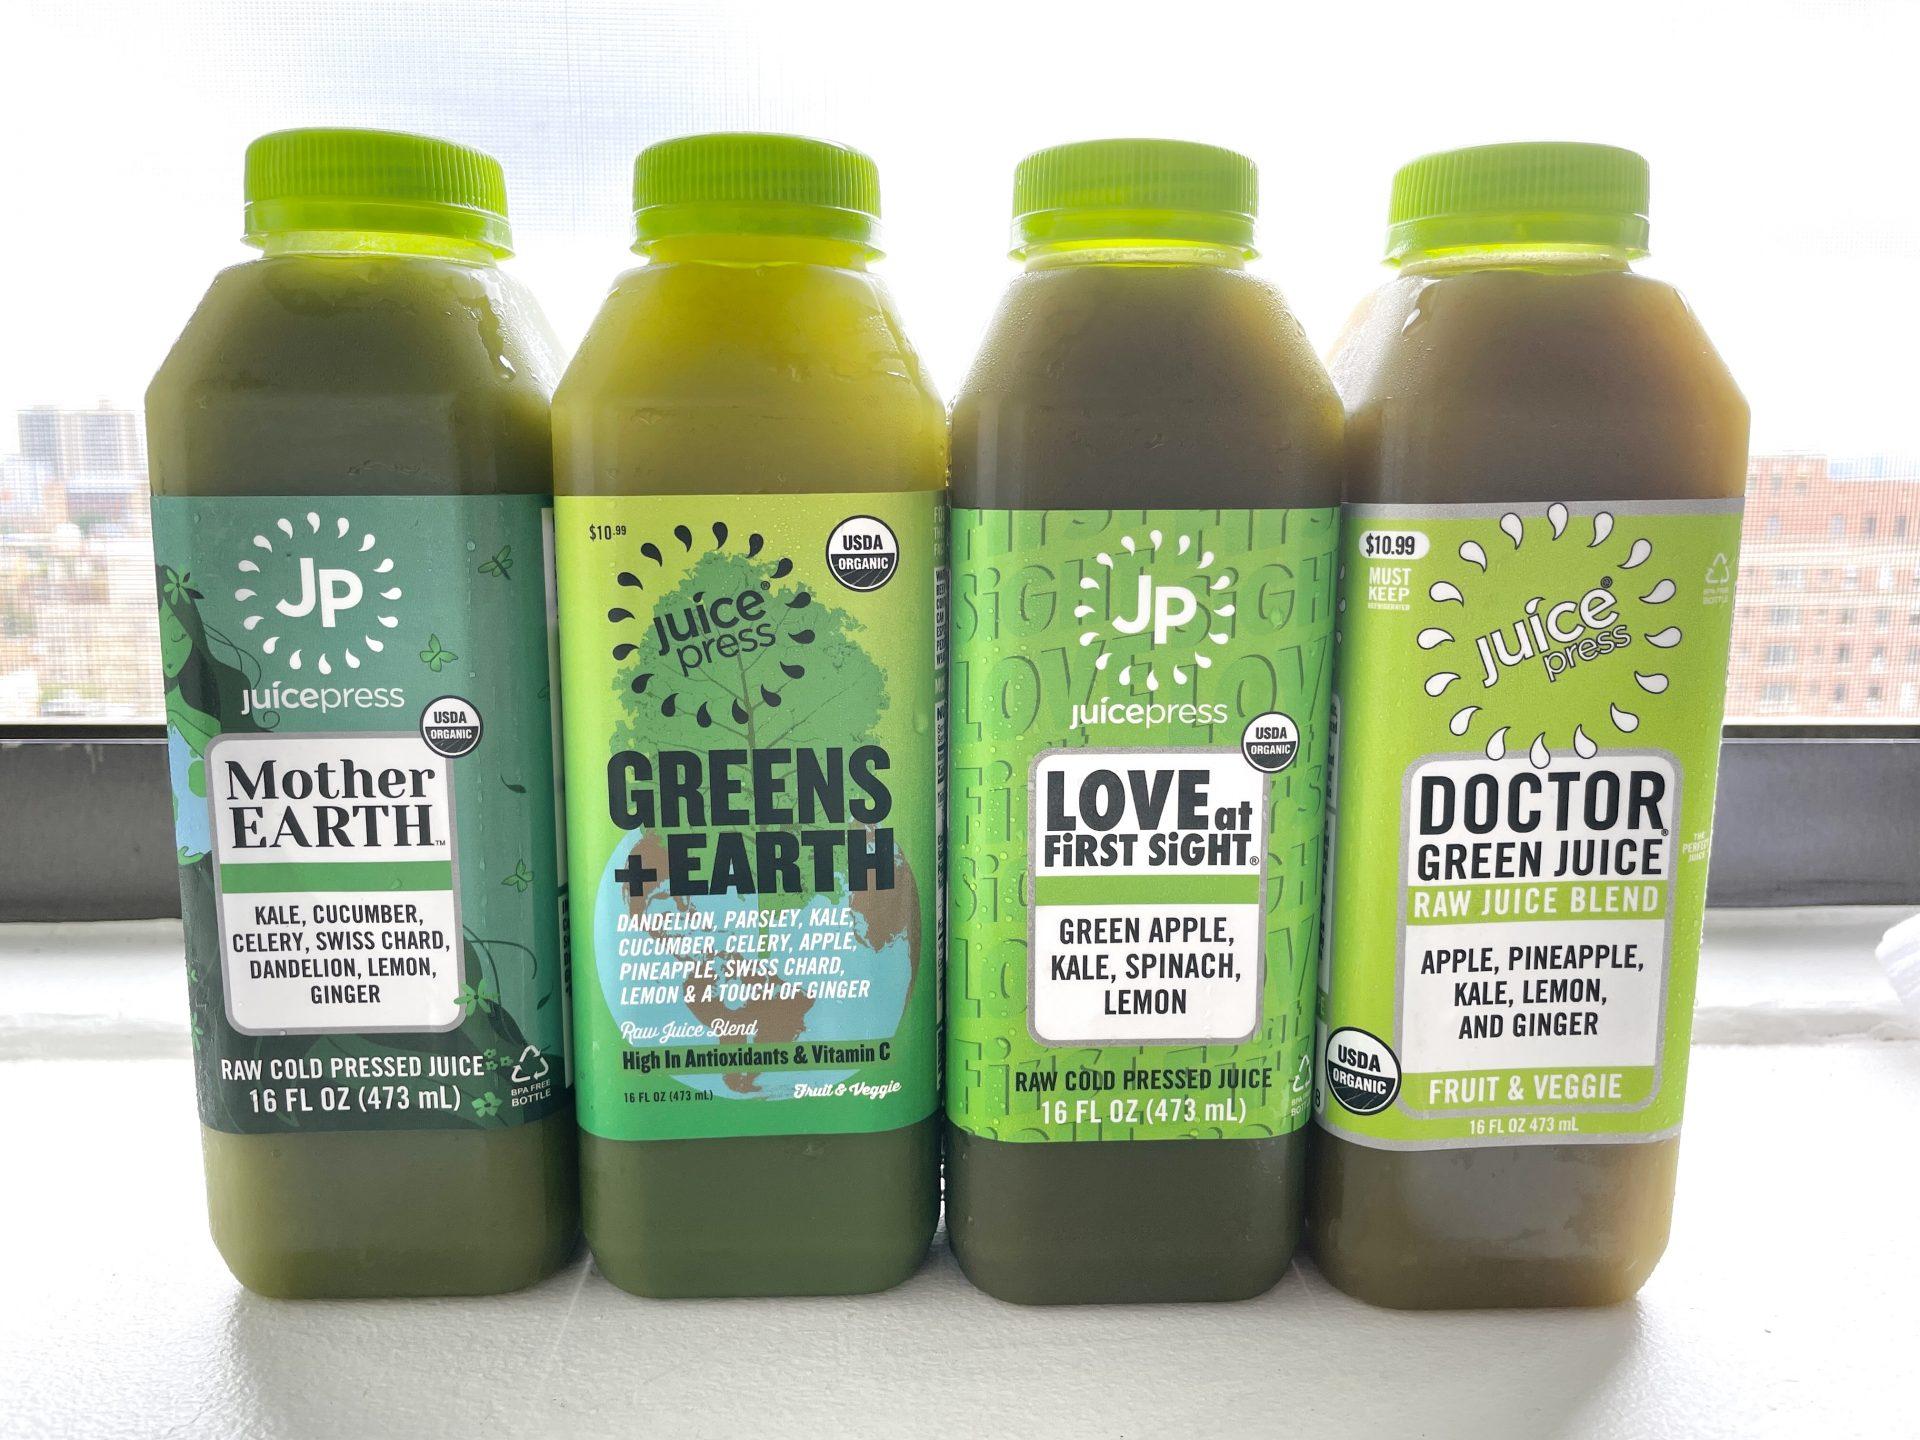 【Juice Press】美味しいグリーン系ジュースはコレ!本場のコールドプレスジュースを飲み比べ(ジュースプレス)